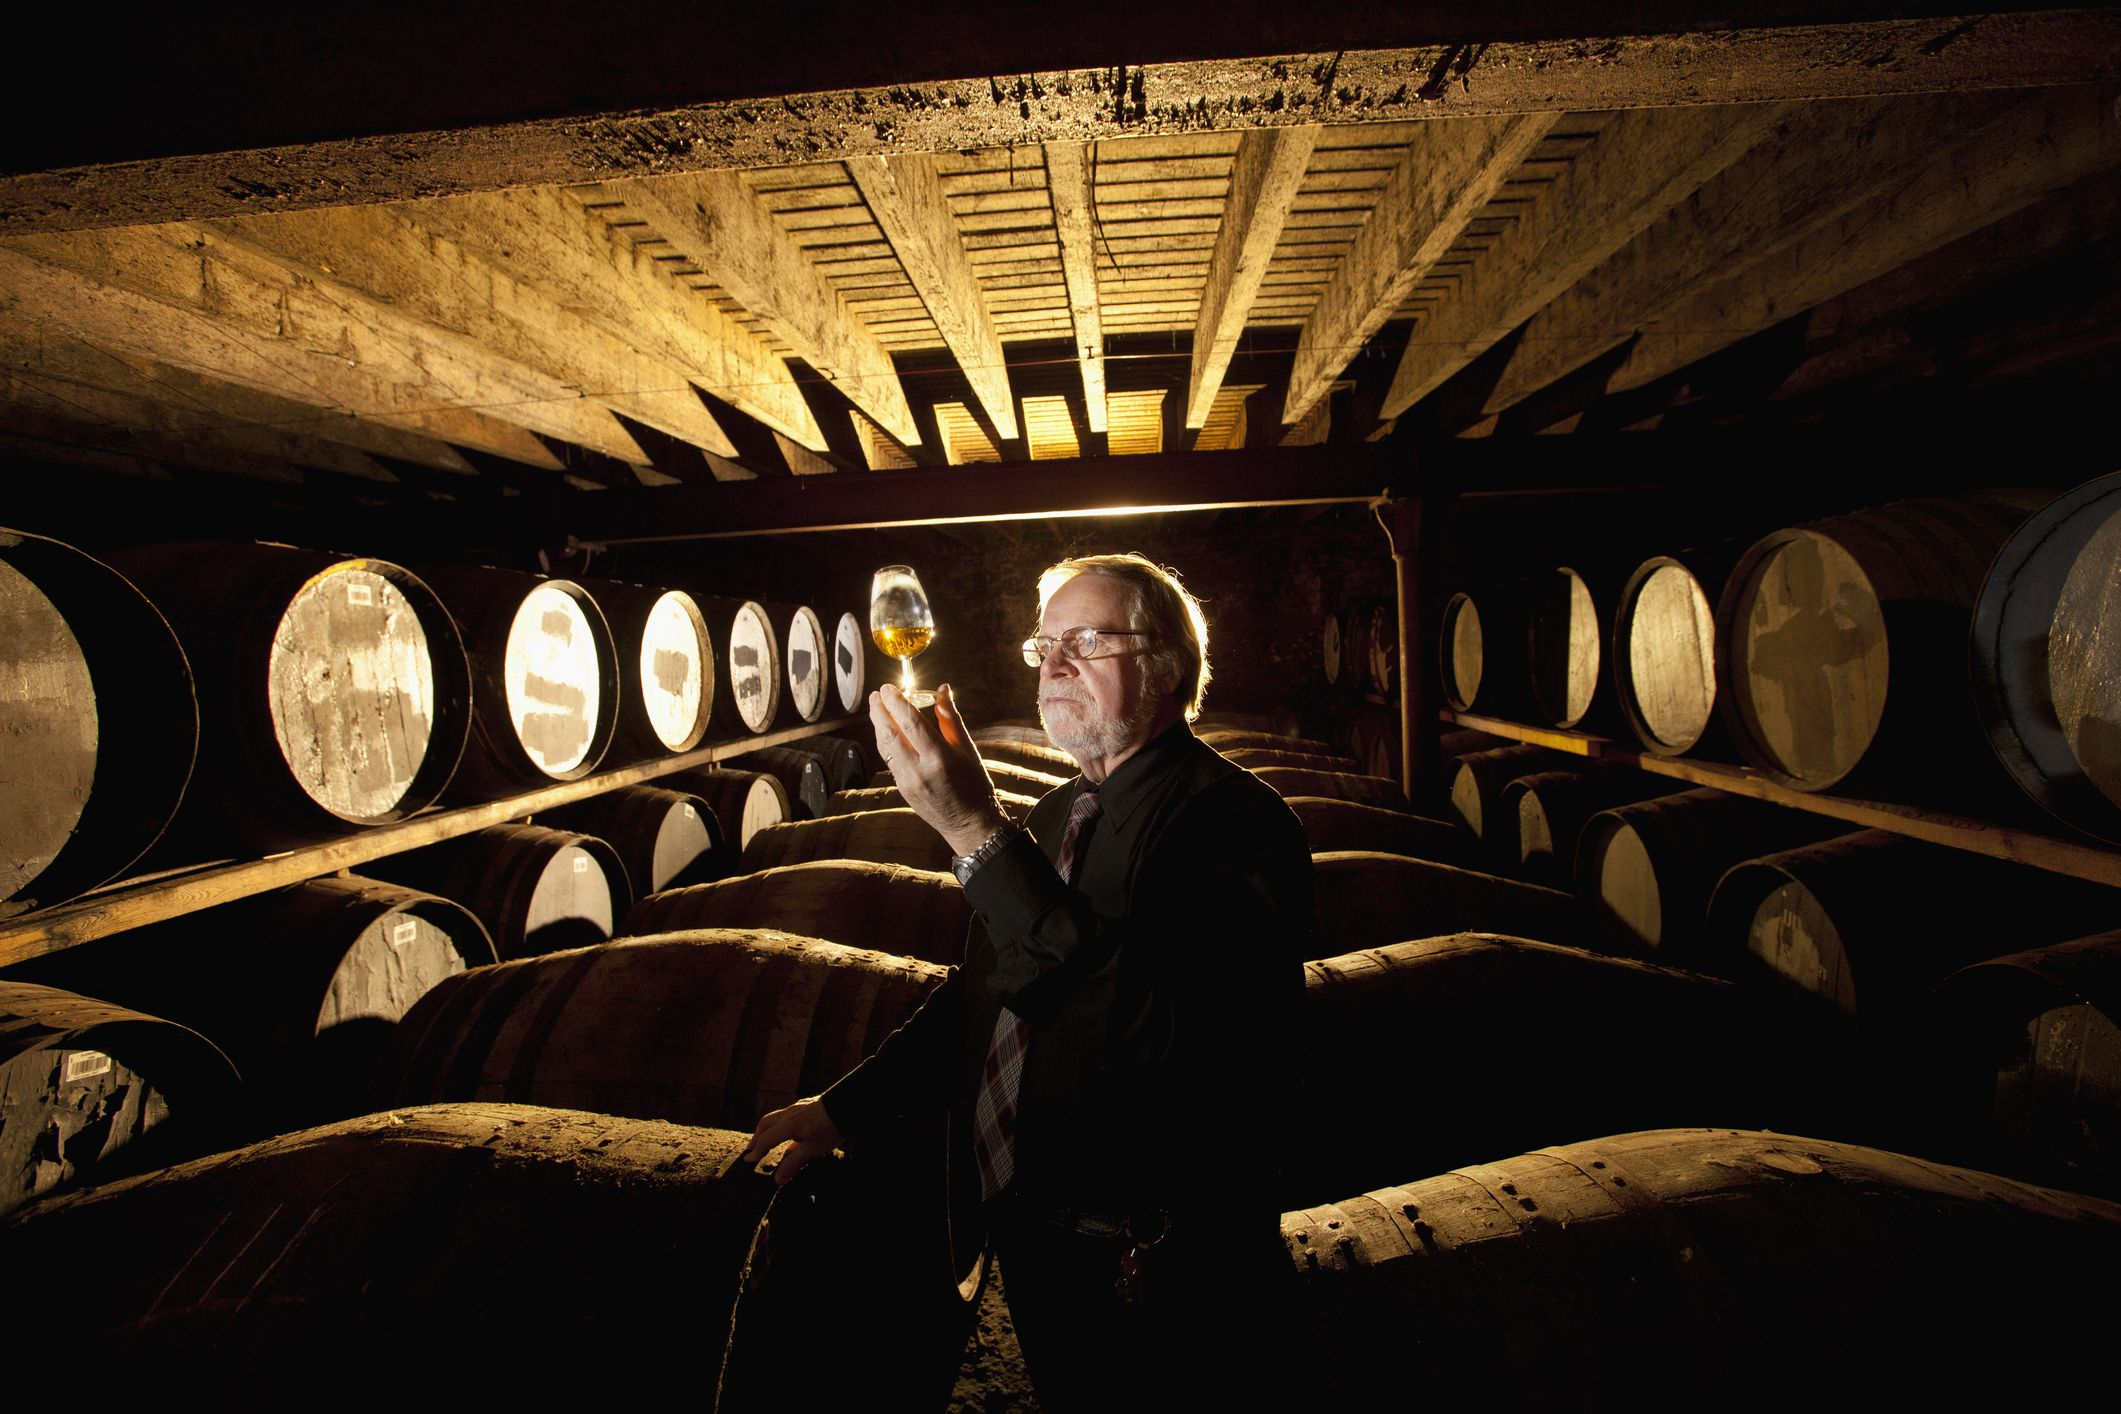 Worker testing whisky in distillery